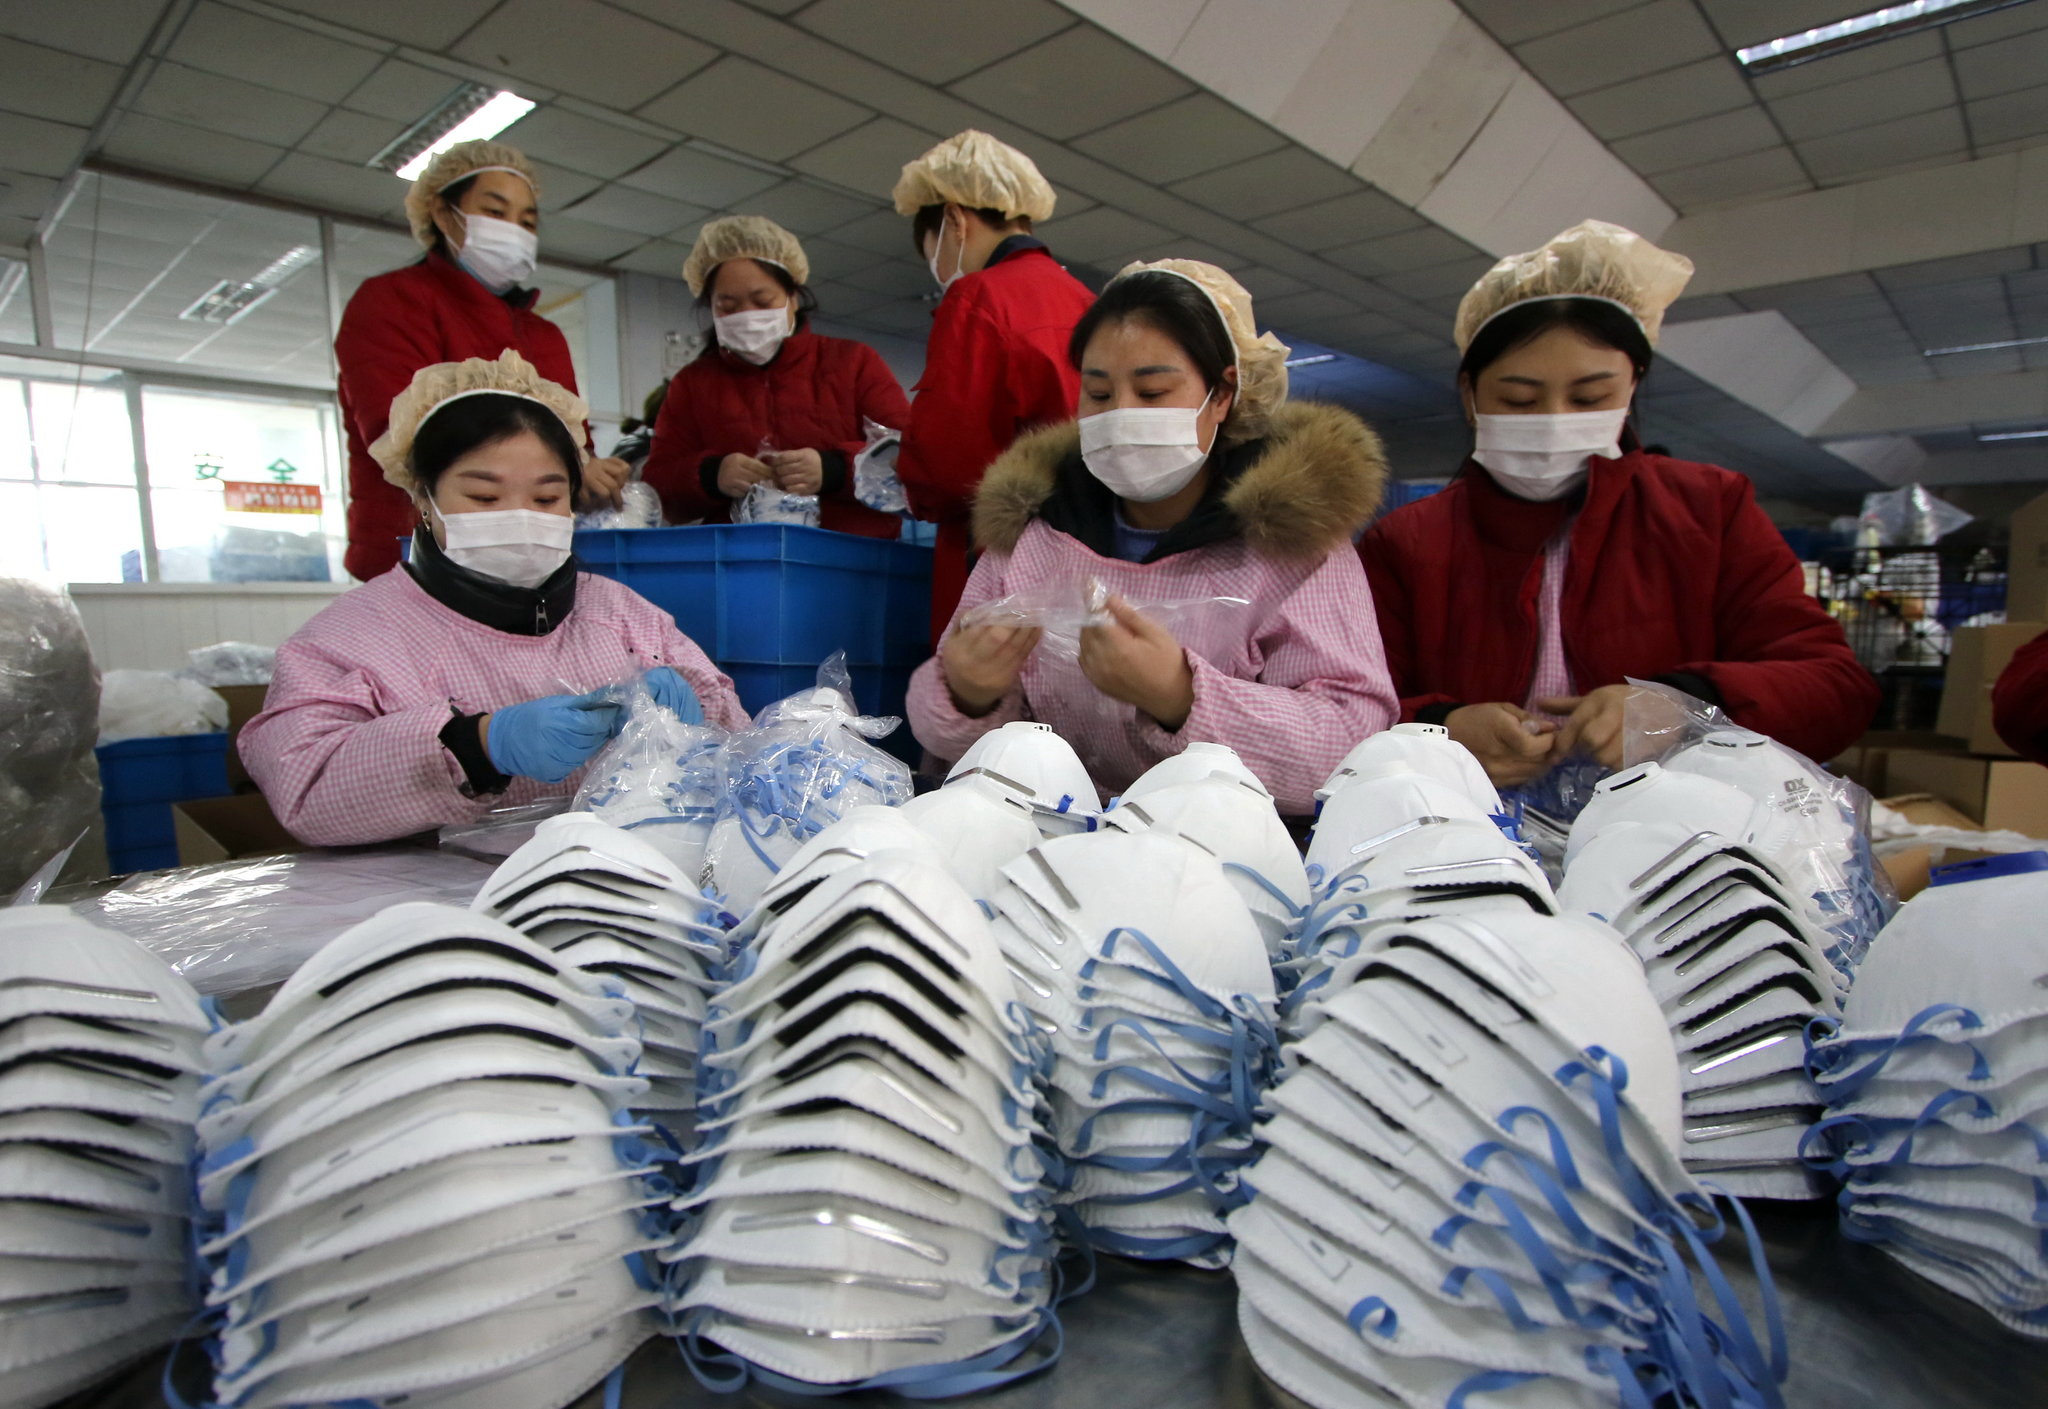 Many in China Wear Them, but Do Masks Block Coronavirus? - The New ...